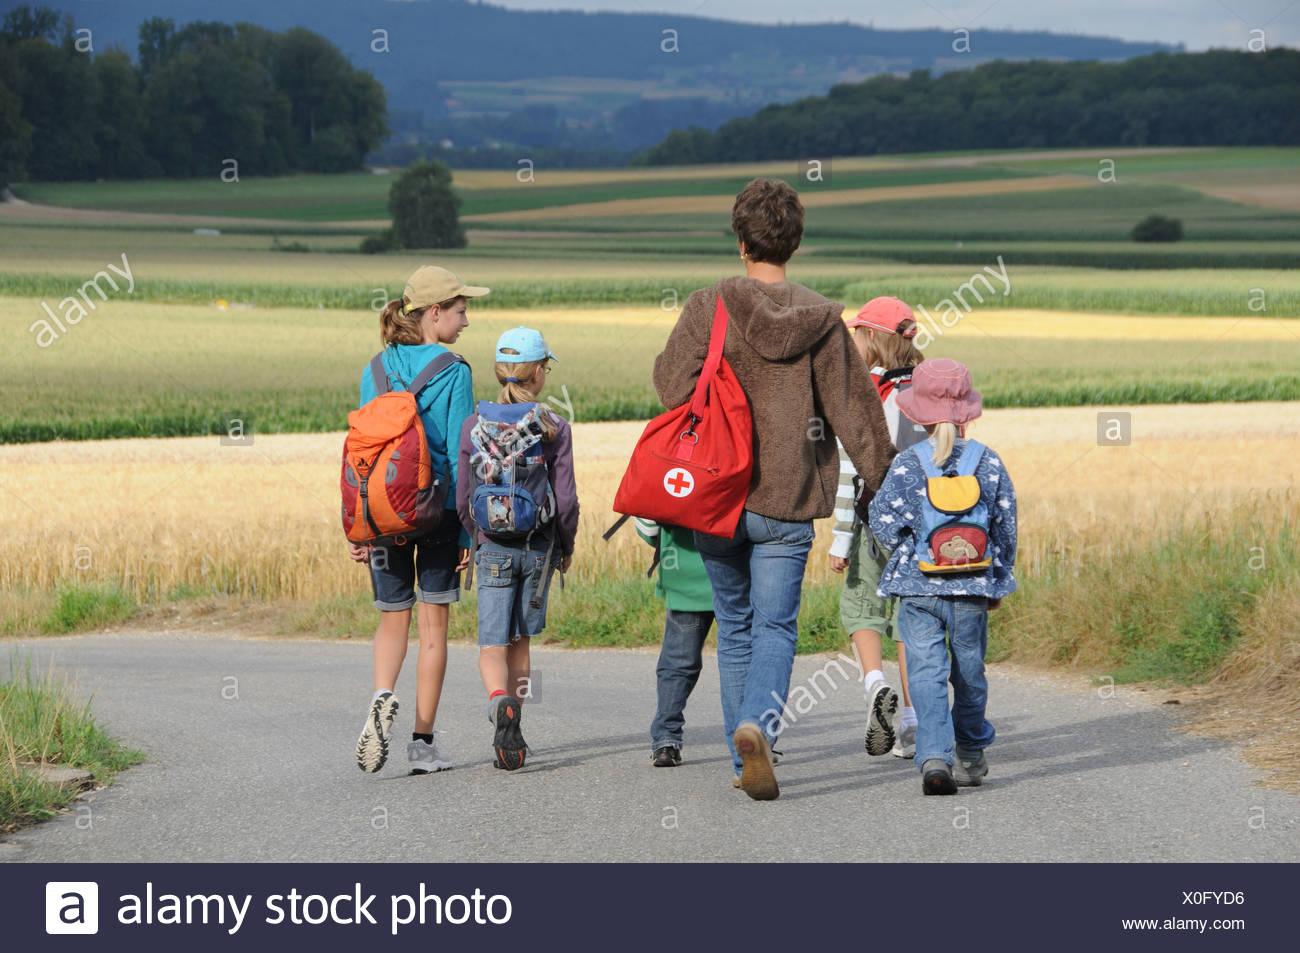 Pupil, school, trip, hikin, walking, fields, way, excursion, Switzerland - Stock Image